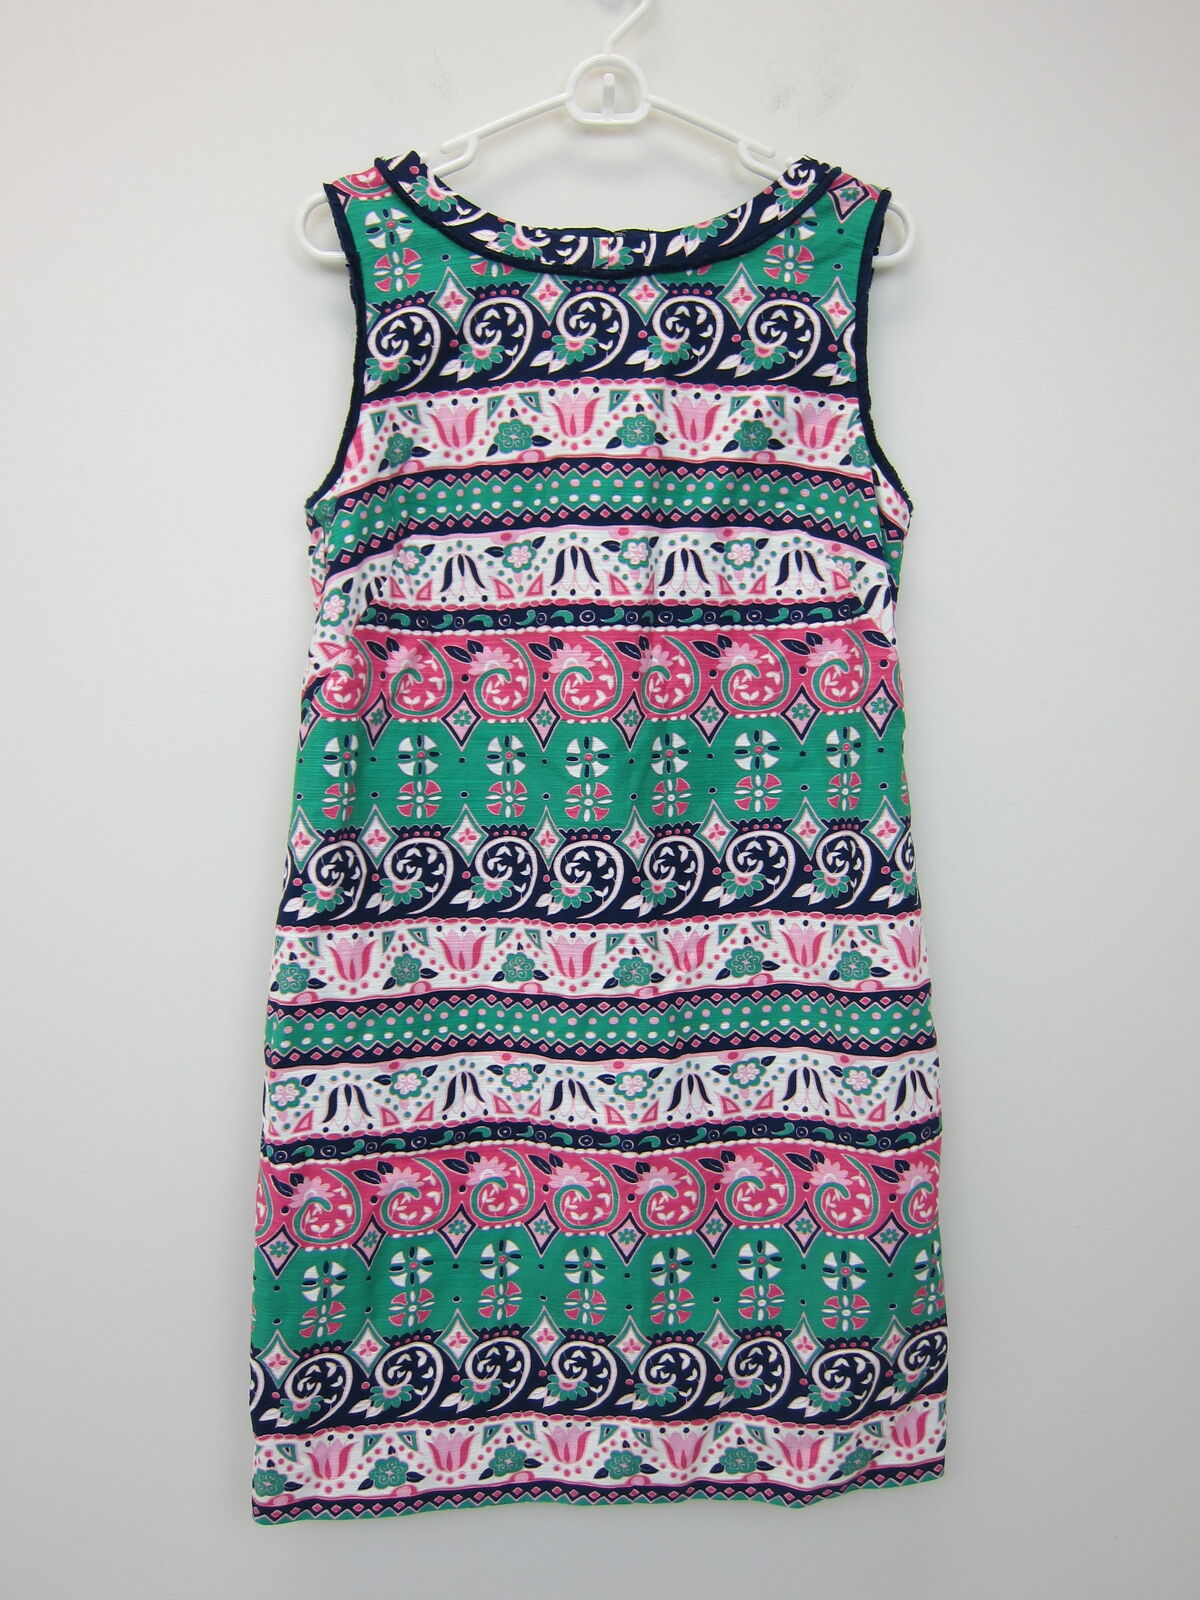 Talbots Woherren Texturot Fringe-Neck Shift Dress Größe 10 Multi  NWT